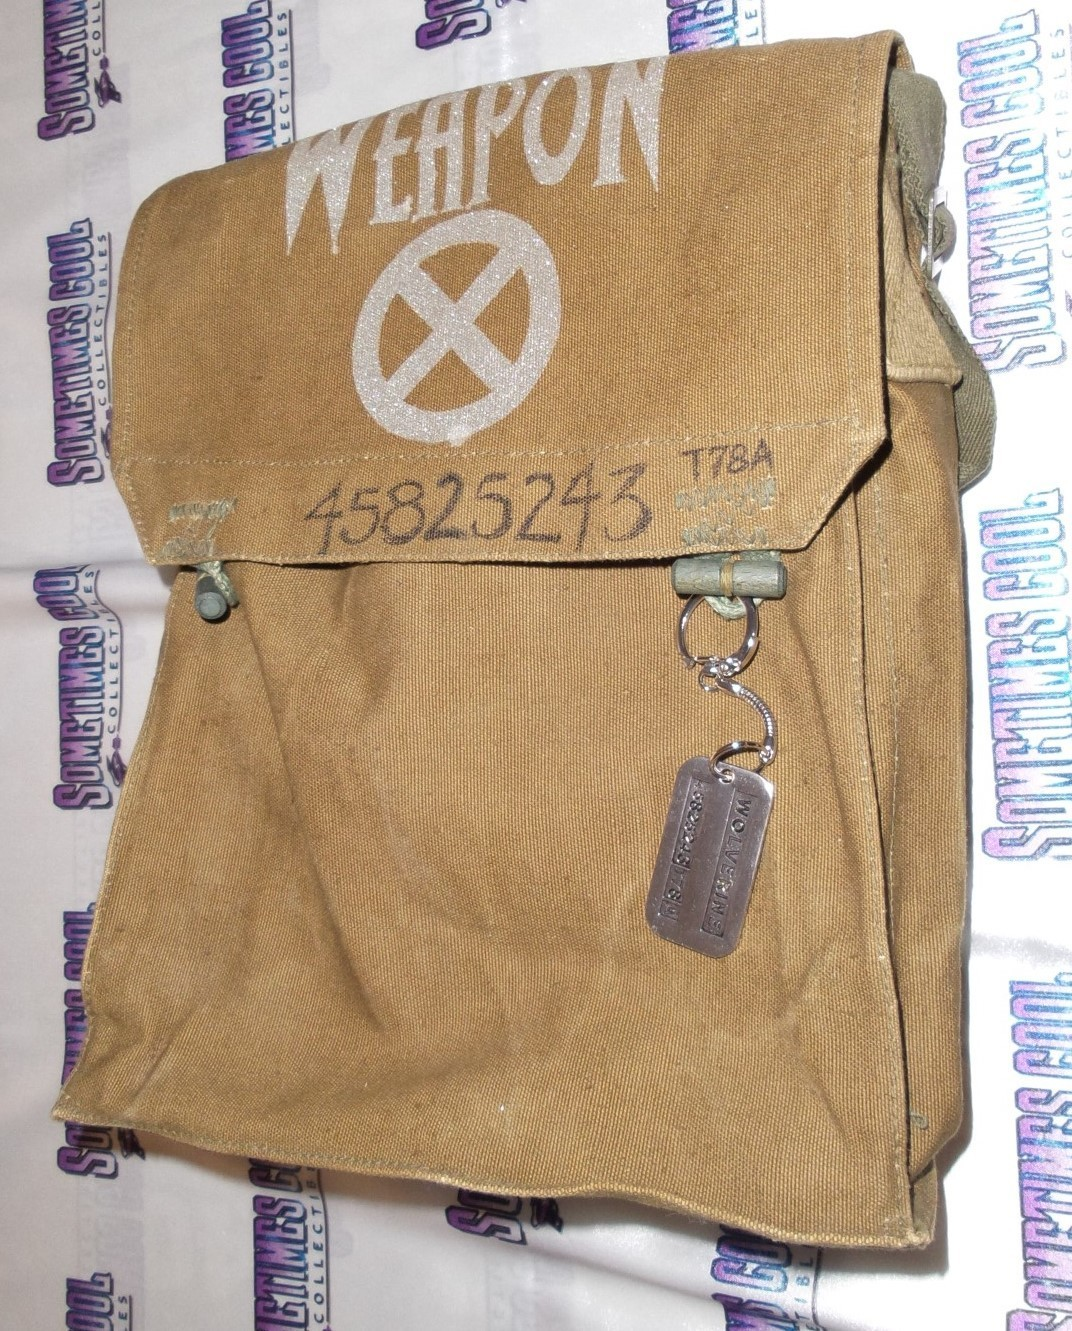 Weapon X Satchel